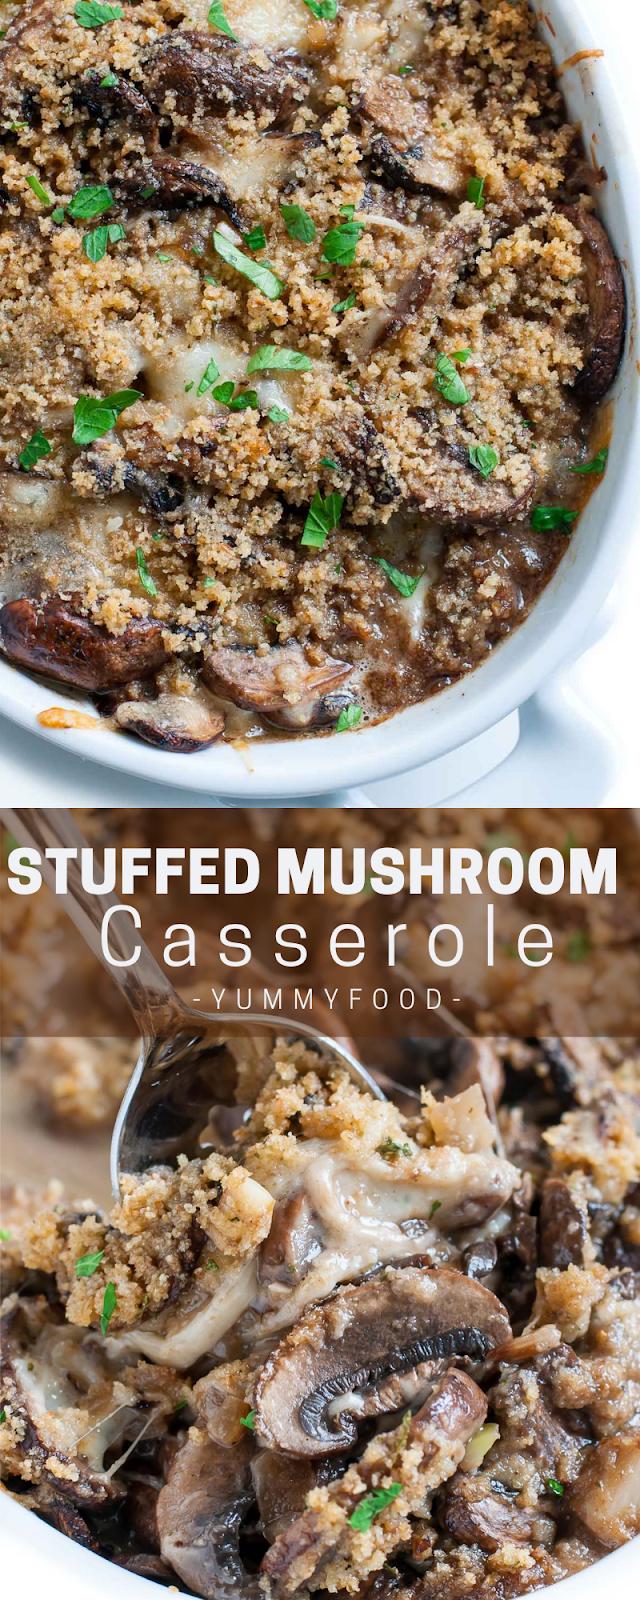 Stuffеd Mushroom Cаѕѕеrоlе